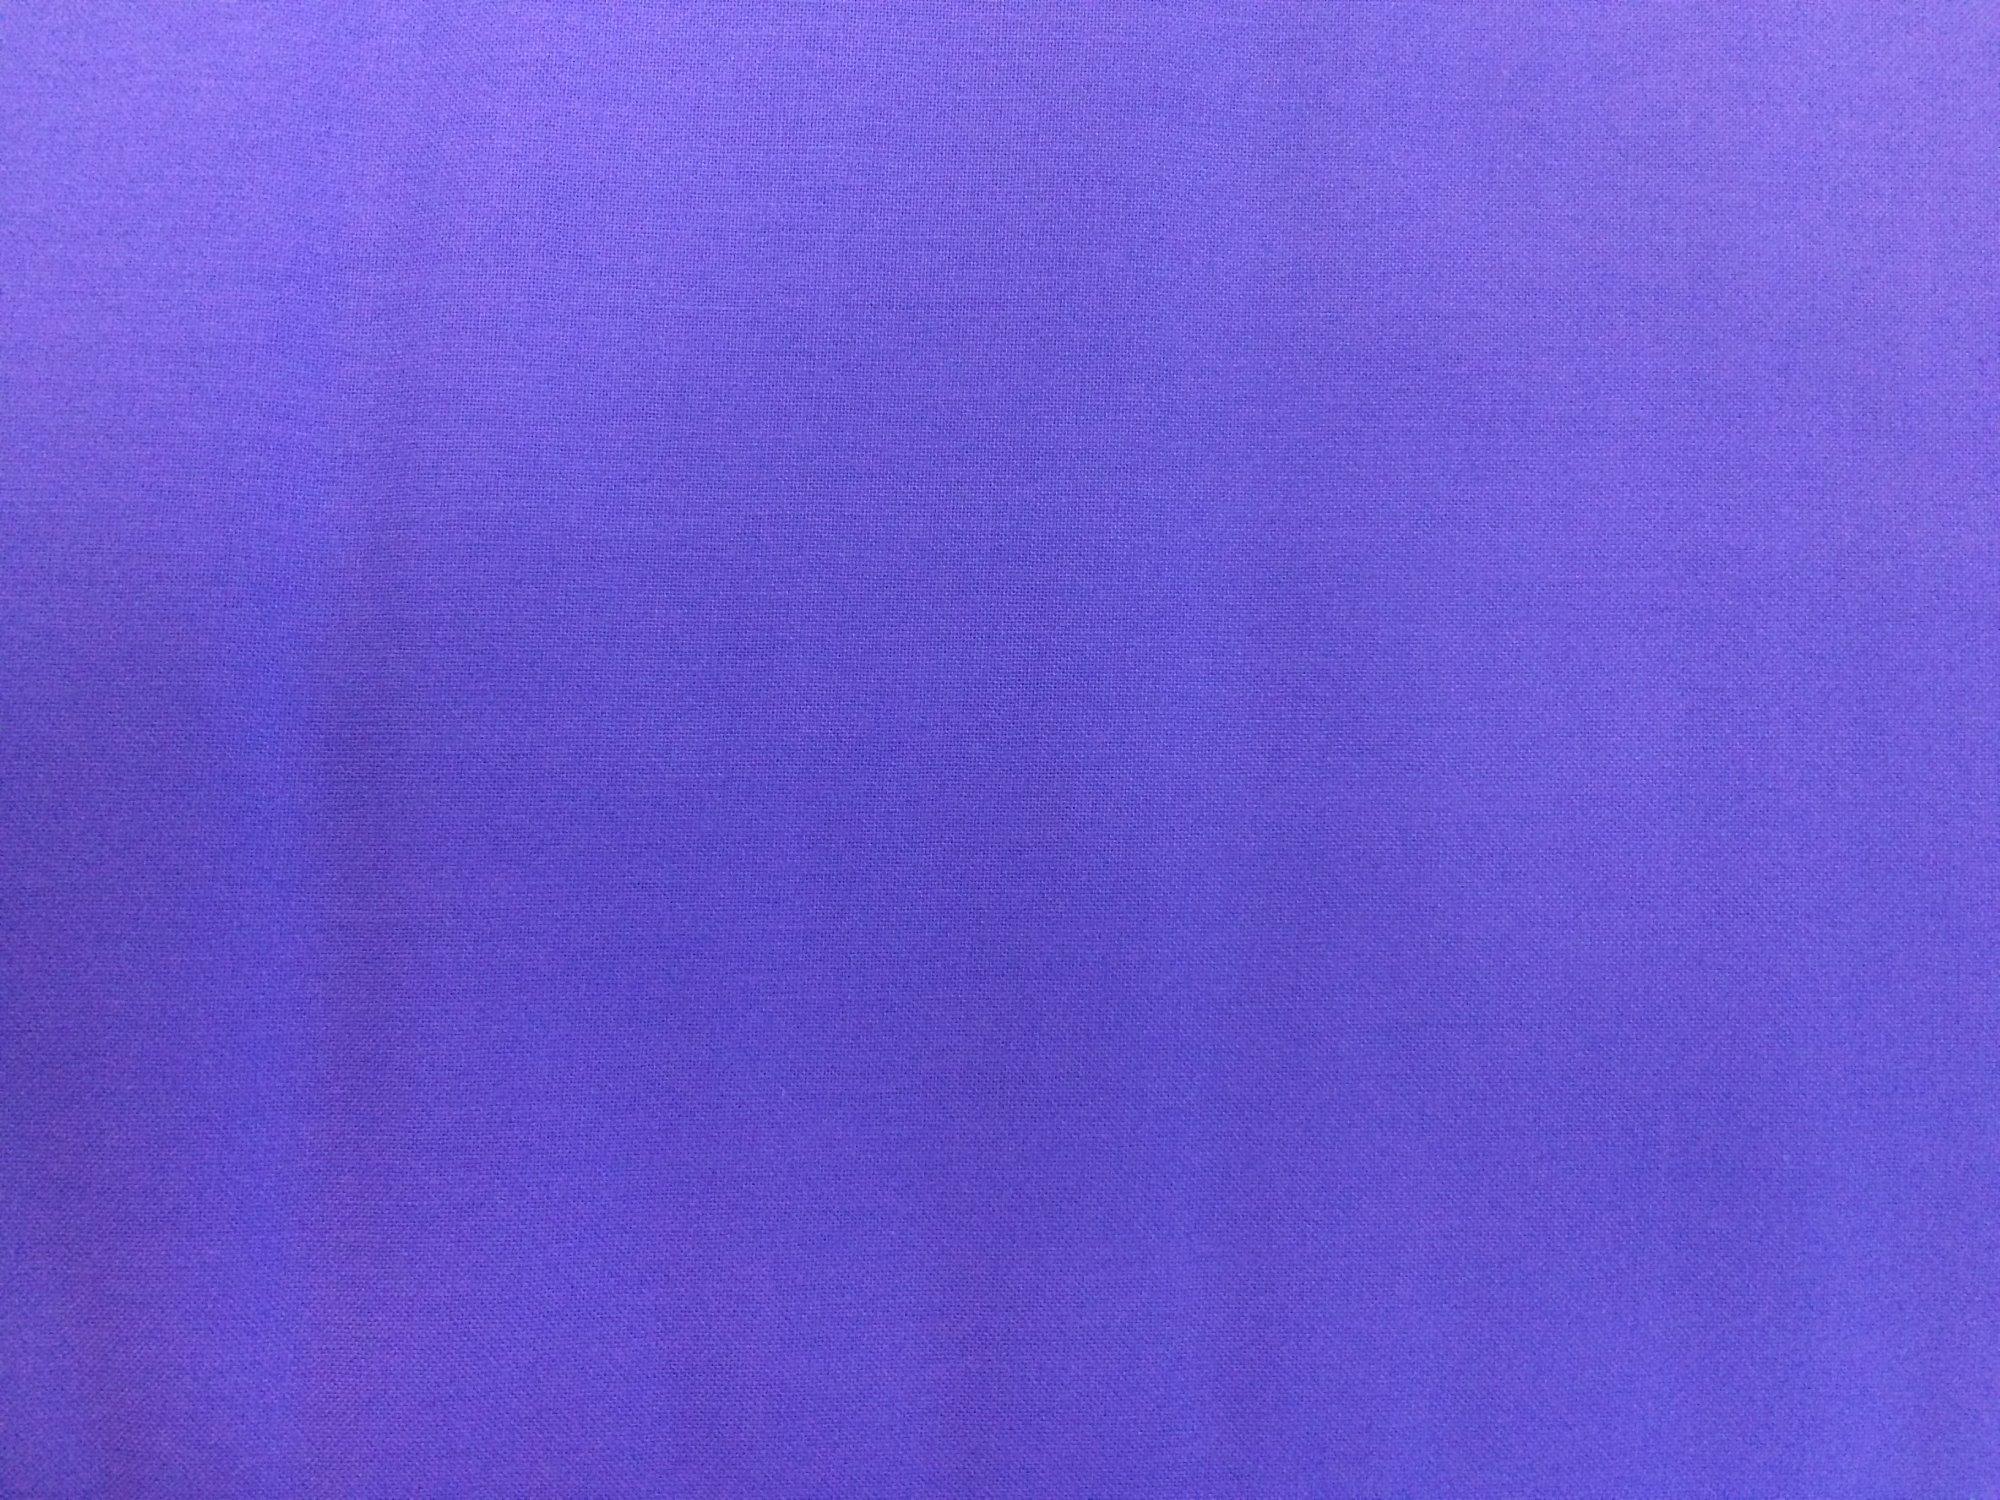 Tula Pink - Designer Essentials - Tula Pink Solids - Iris